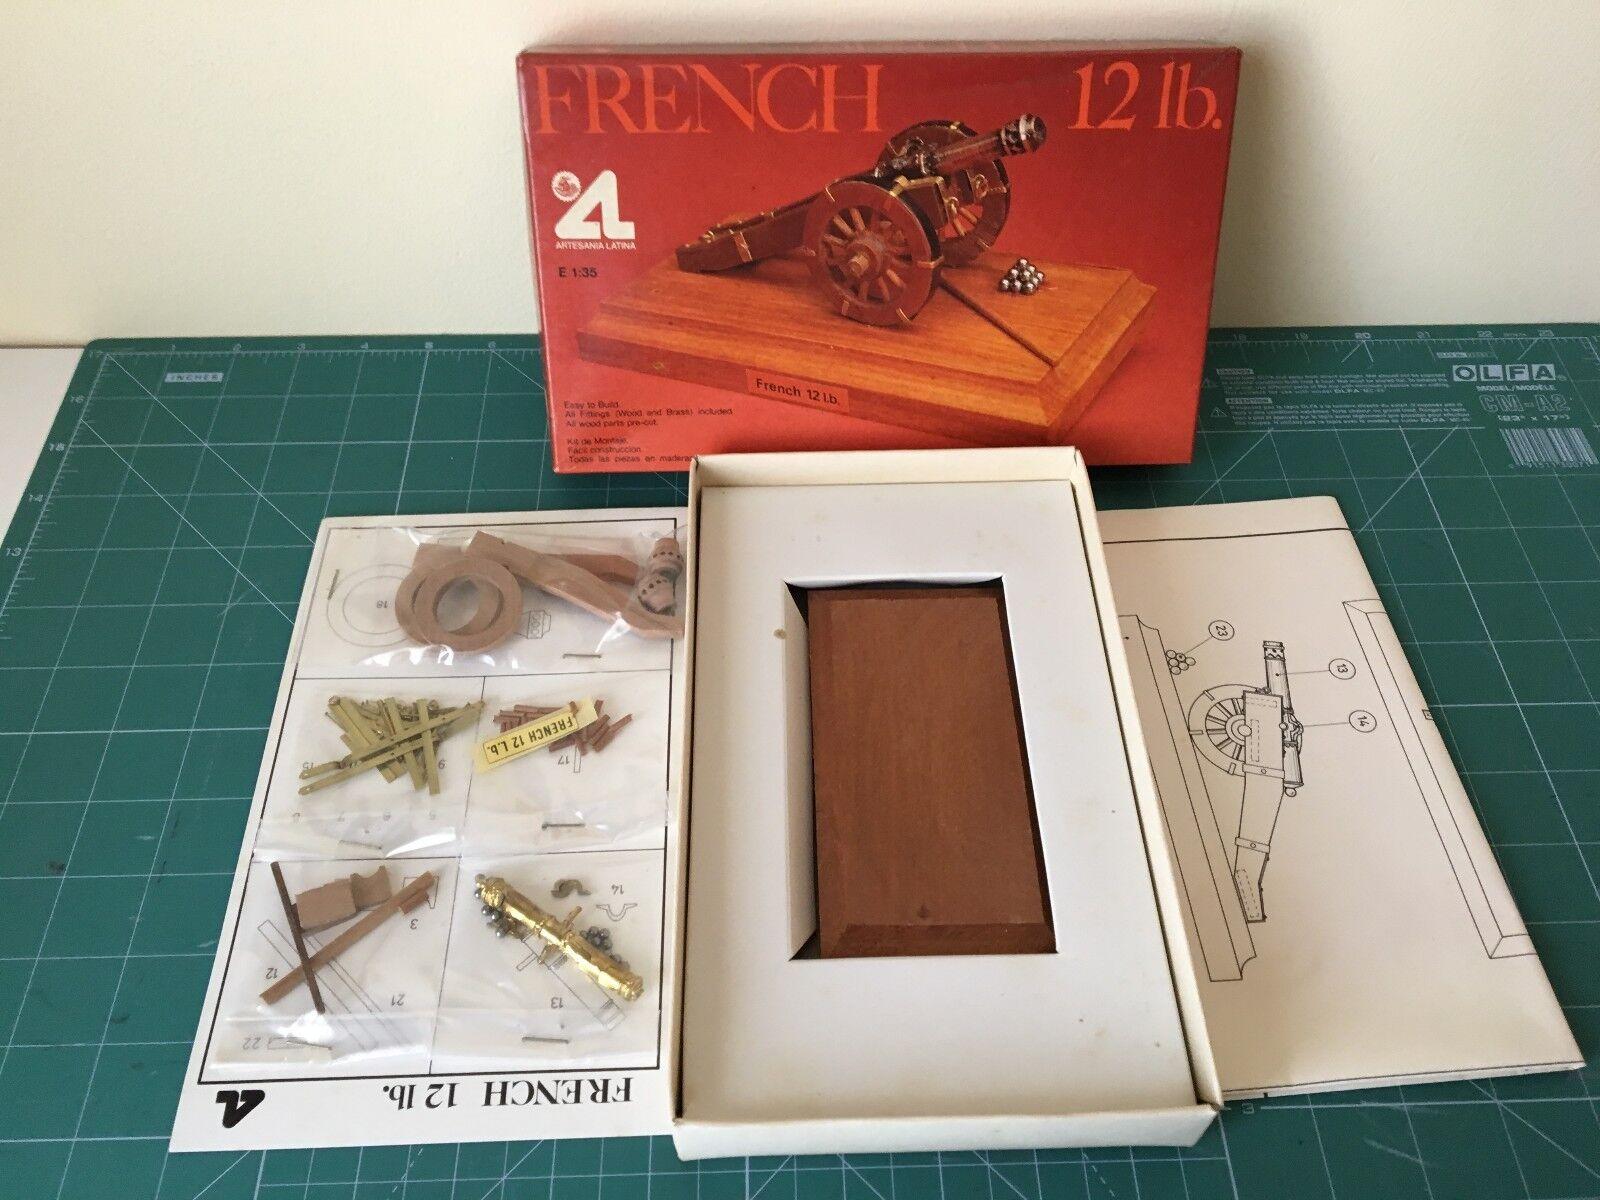 Artesania latina French 12 lb. scale 1 35 new in box see photo